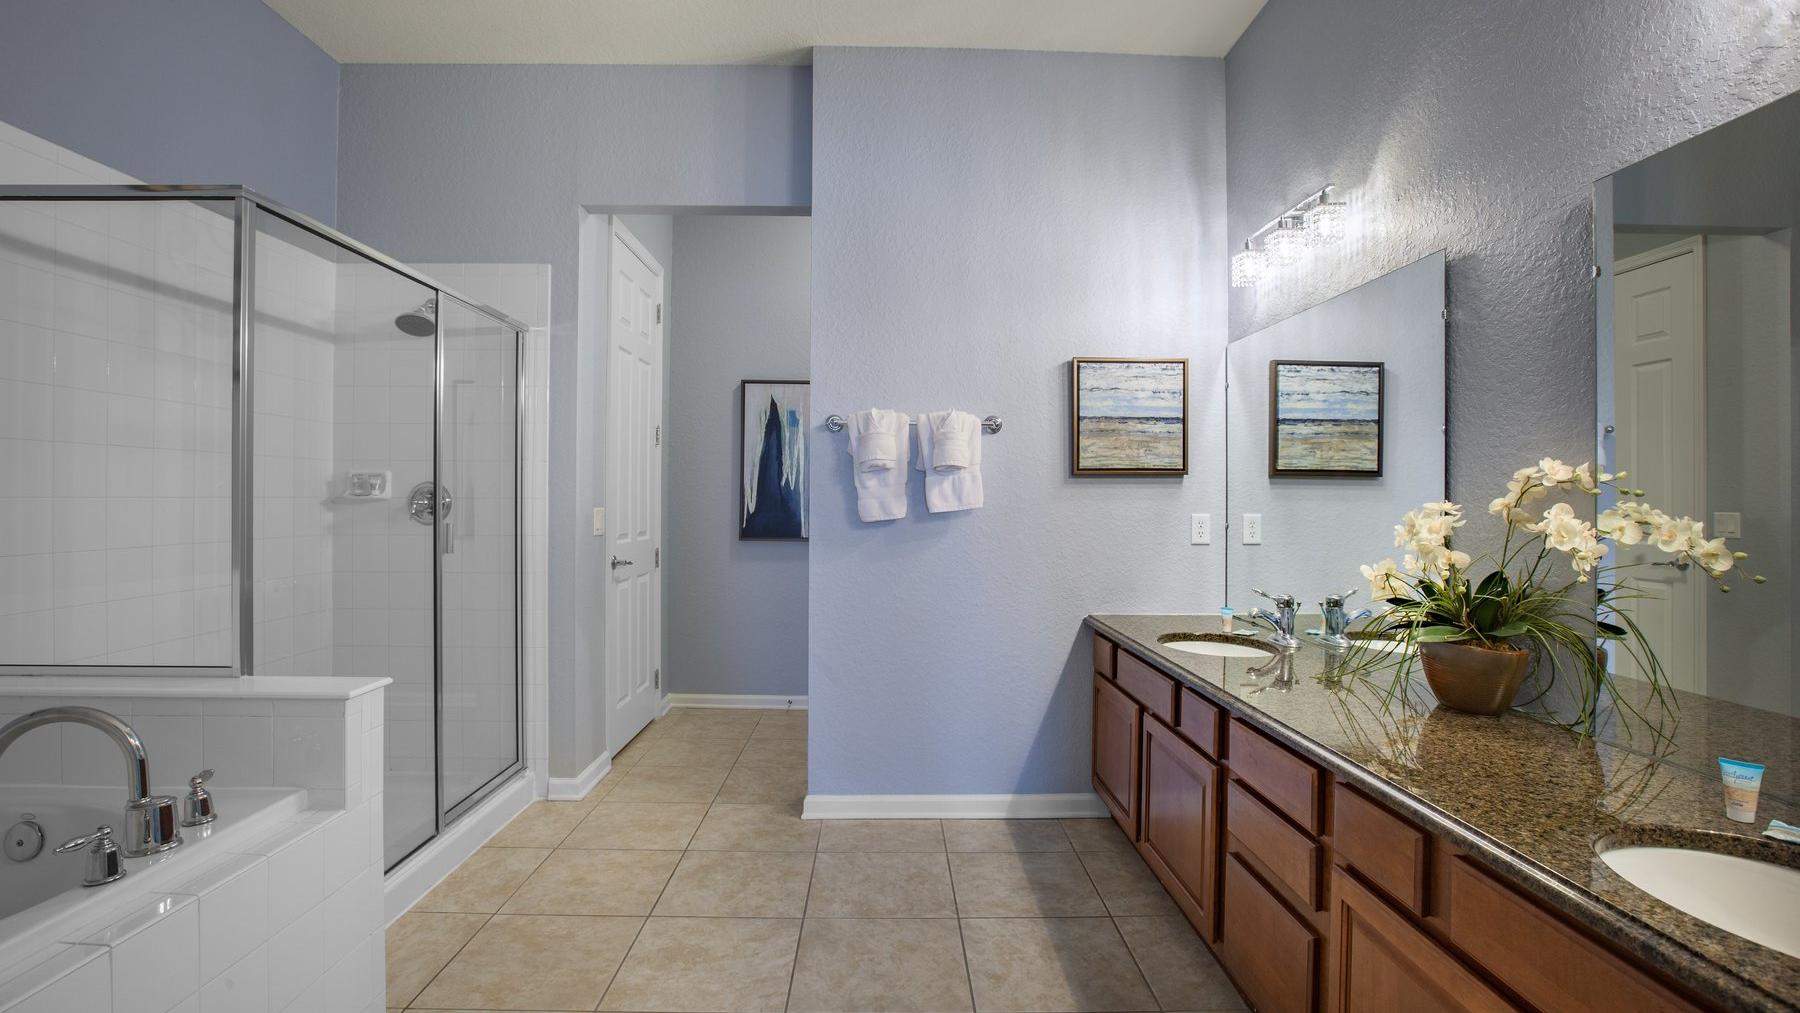 Double sink vanity and walk in shower